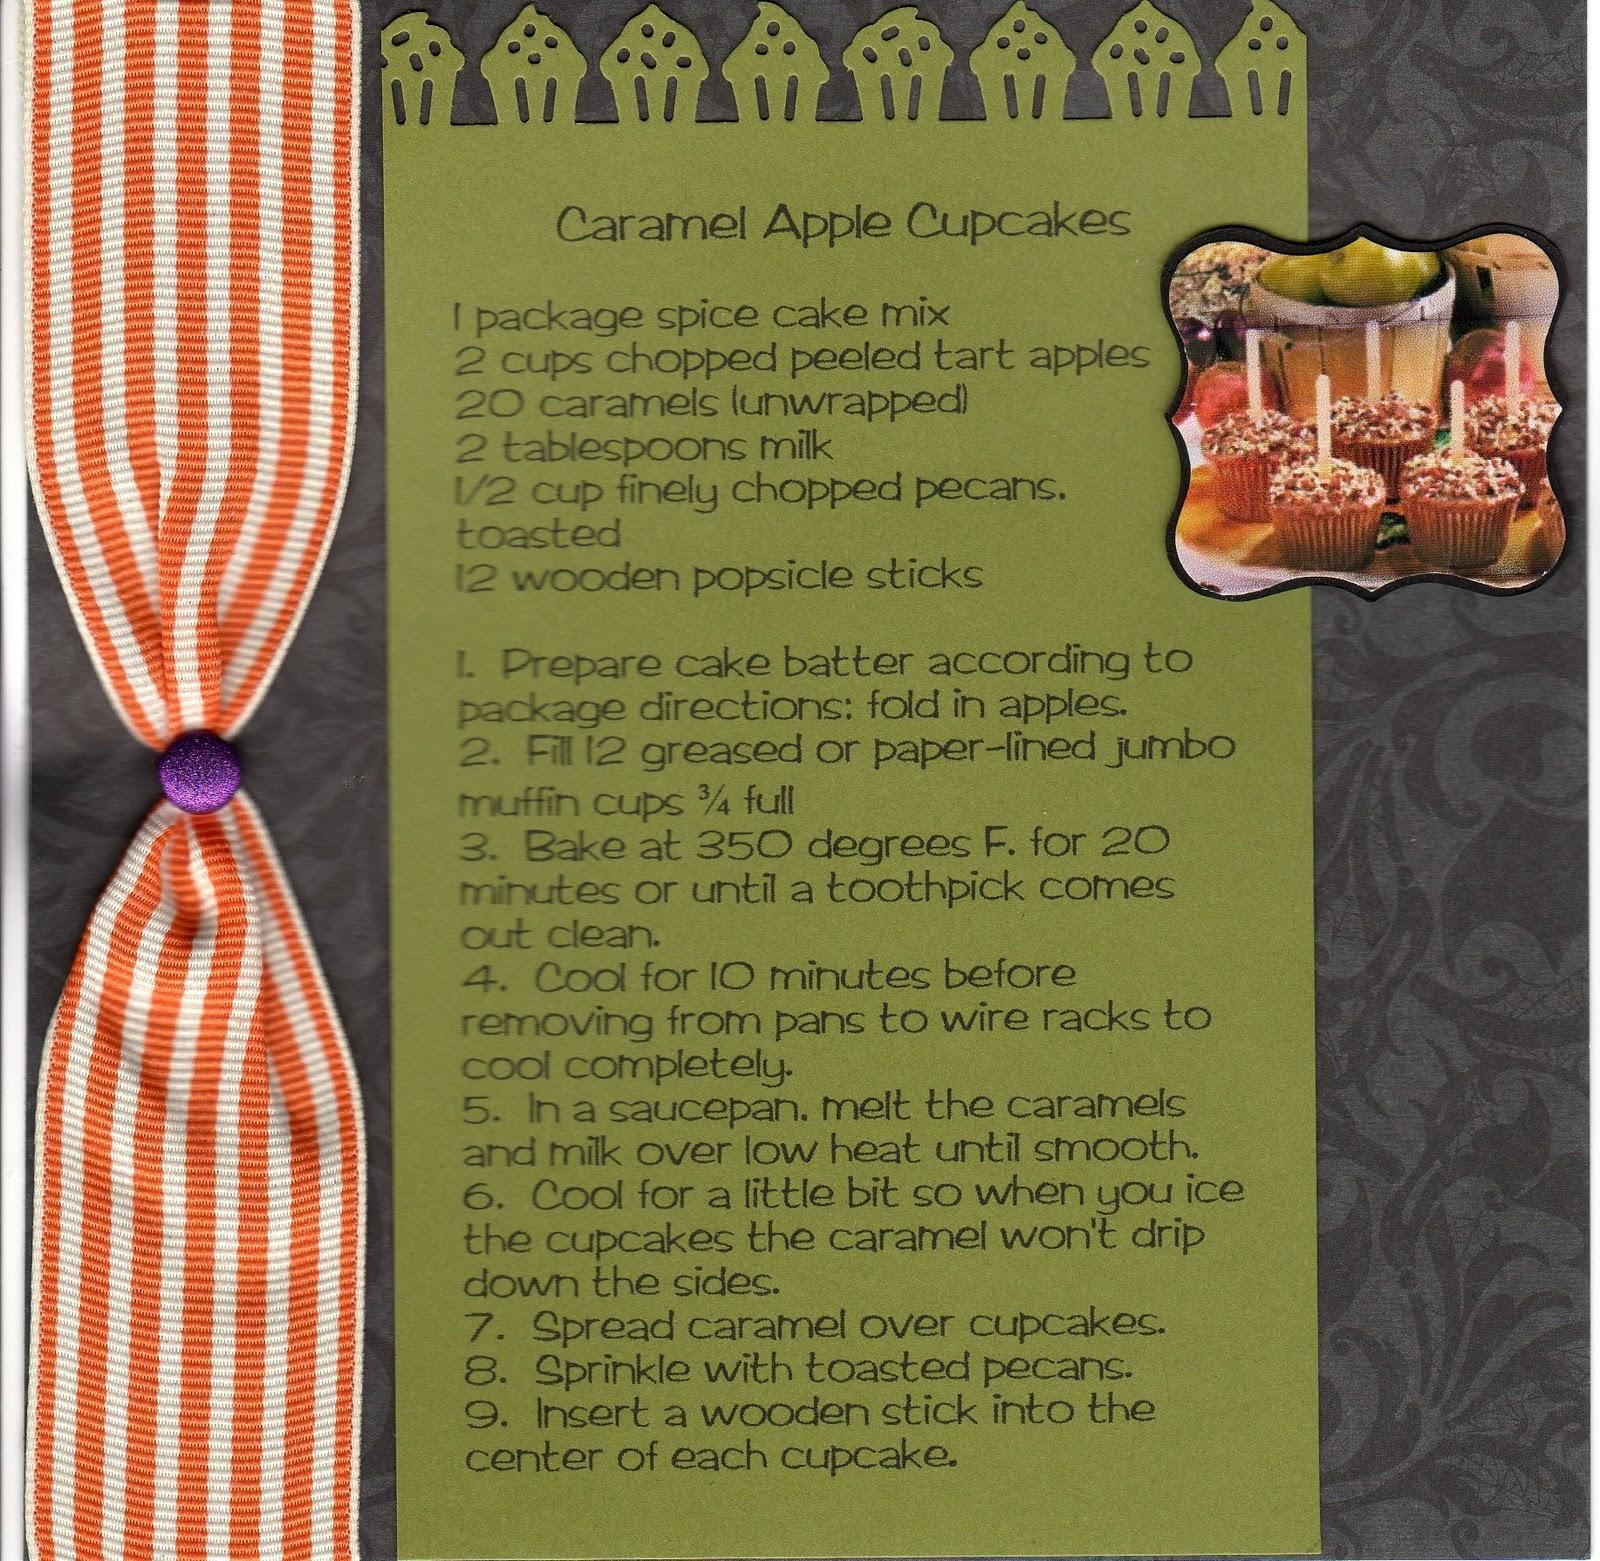 http://1.bp.blogspot.com/_7k9UmJgmgqE/TM3NT81m9VI/AAAAAAAAAn8/EKgn83yS6TU/s1600/Caramel+Apple+Cupcake+6x6.jpg